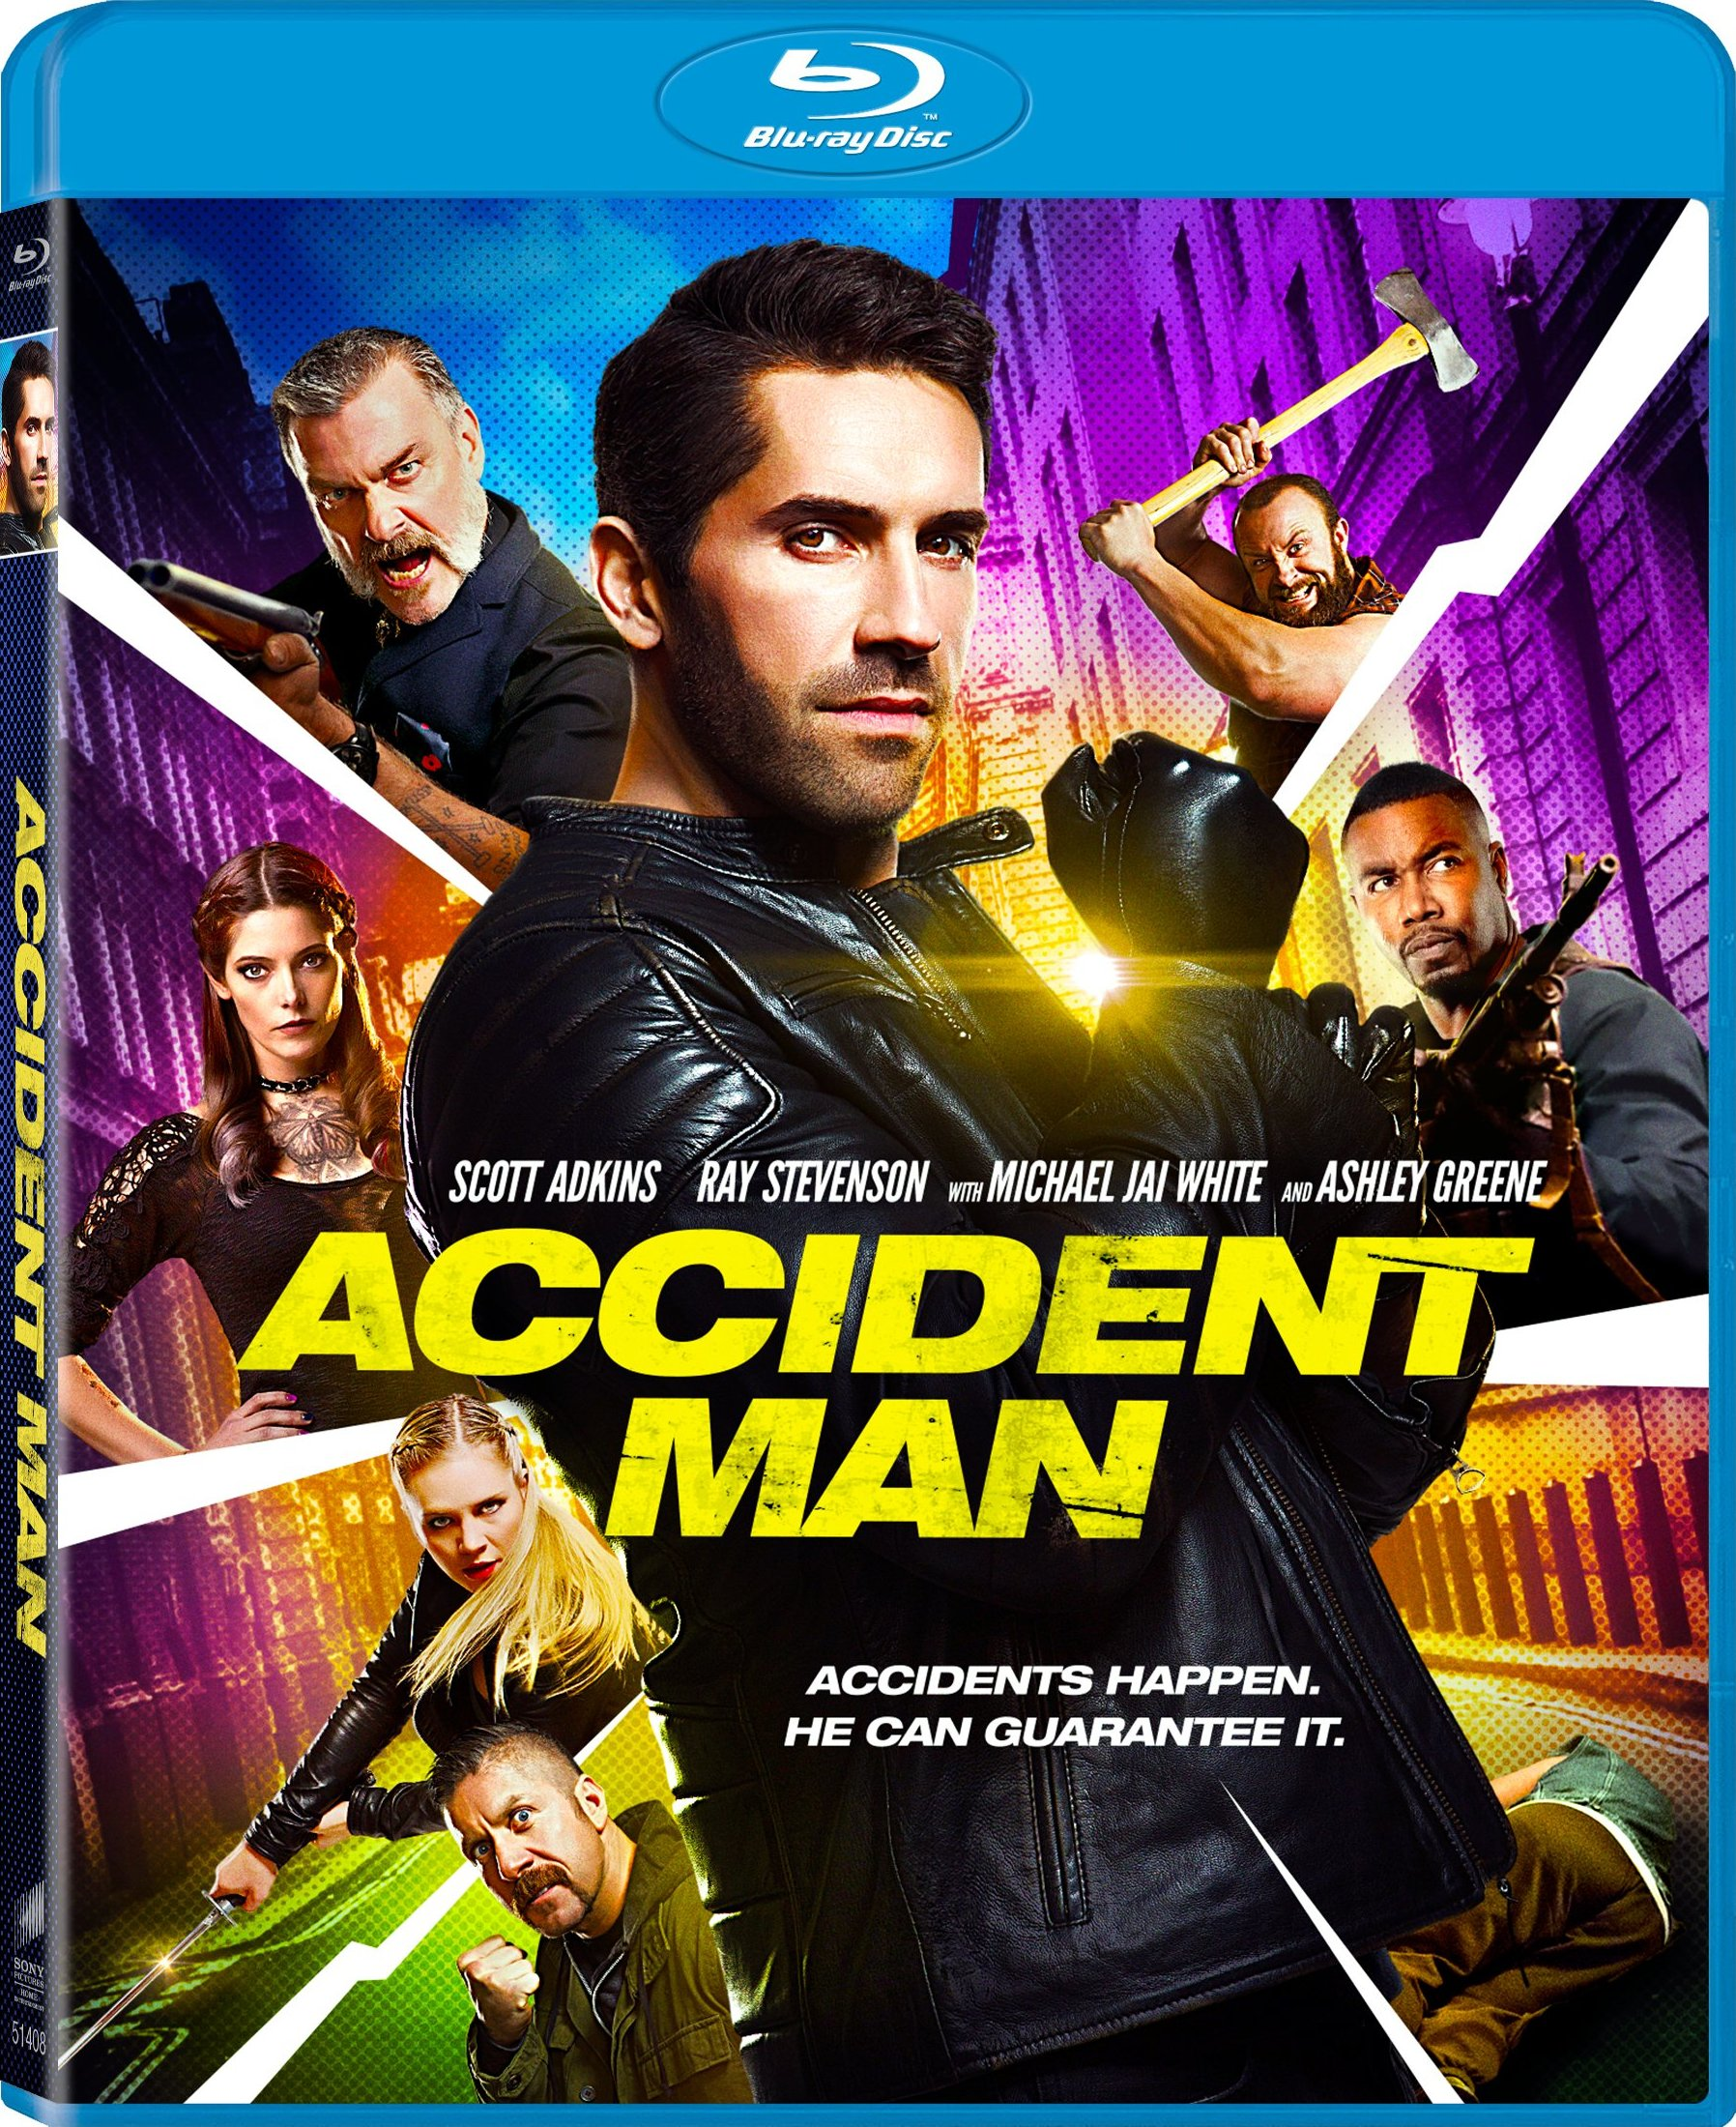 Accident Man (2017) Blu-ray